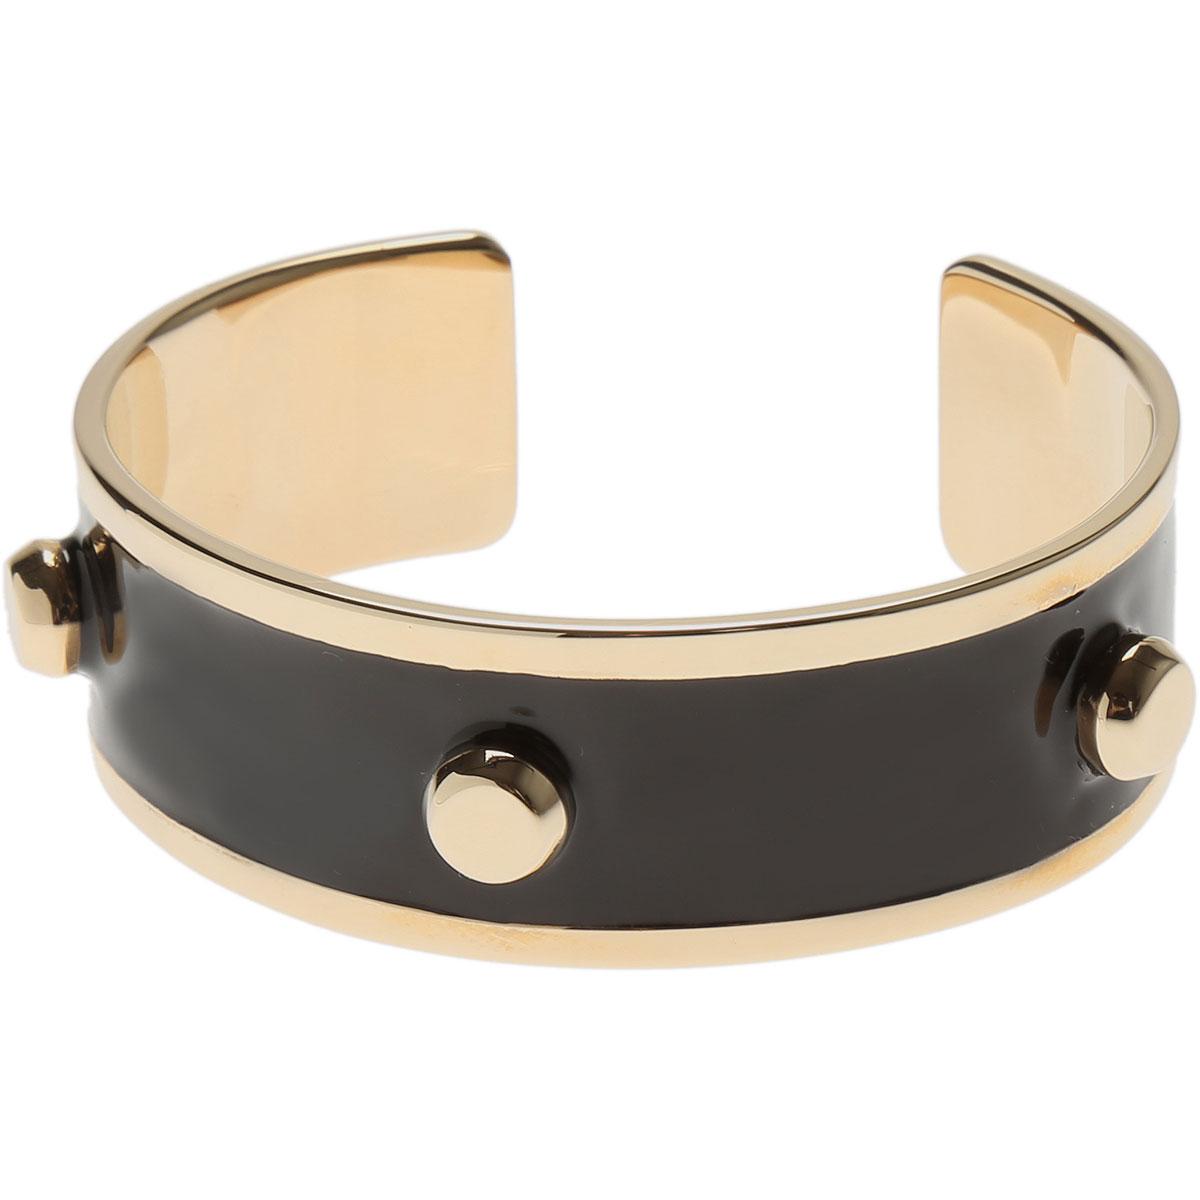 Image of Furla Bracelet for Women, Black, Metal, 2017